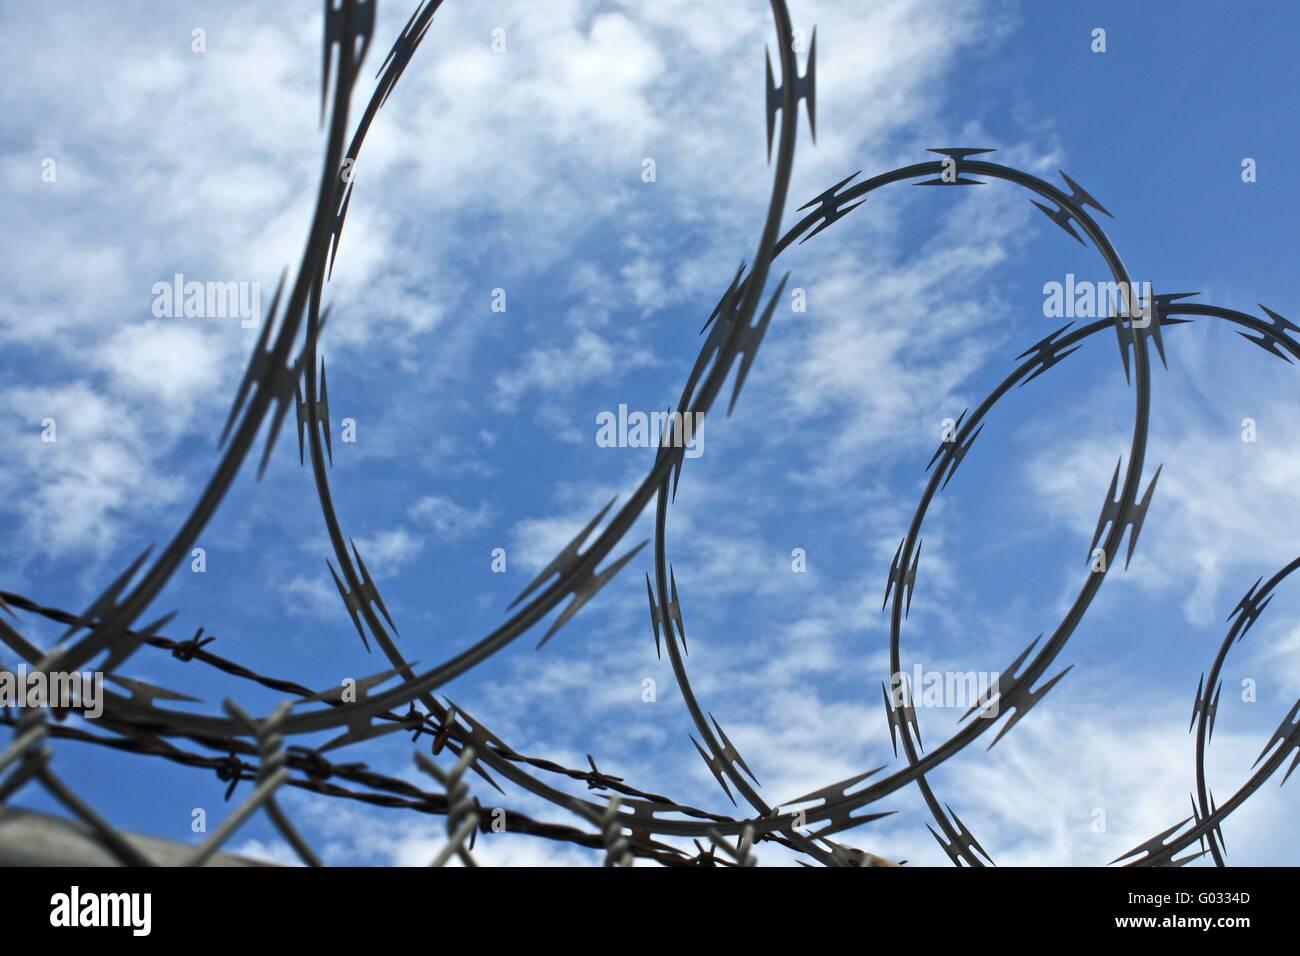 Steel Razor Wire Perimeter Fence Stock Photos & Steel Razor Wire ...